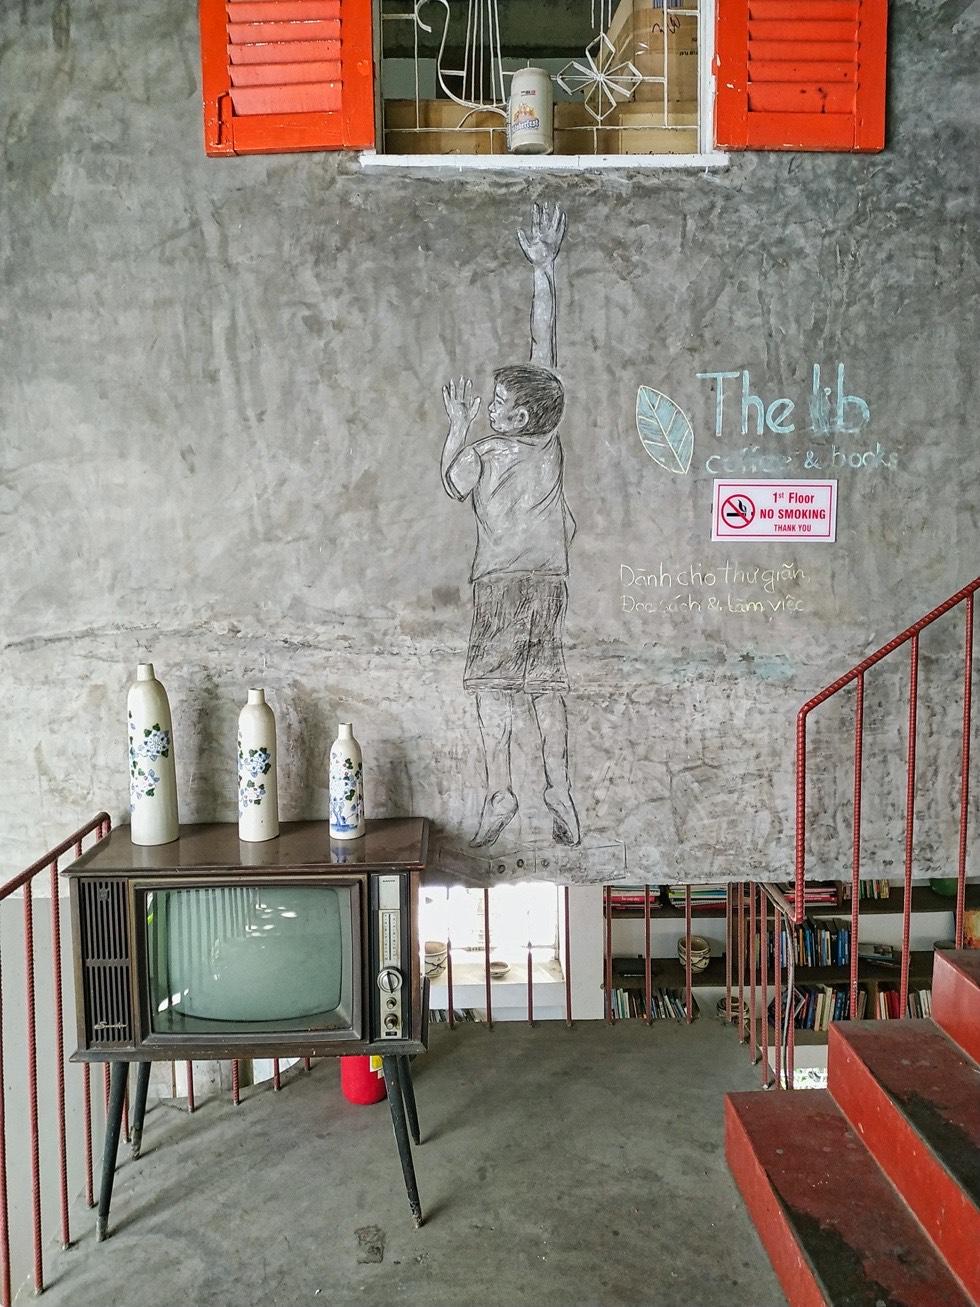 The LIB Coffee and Books Artistic